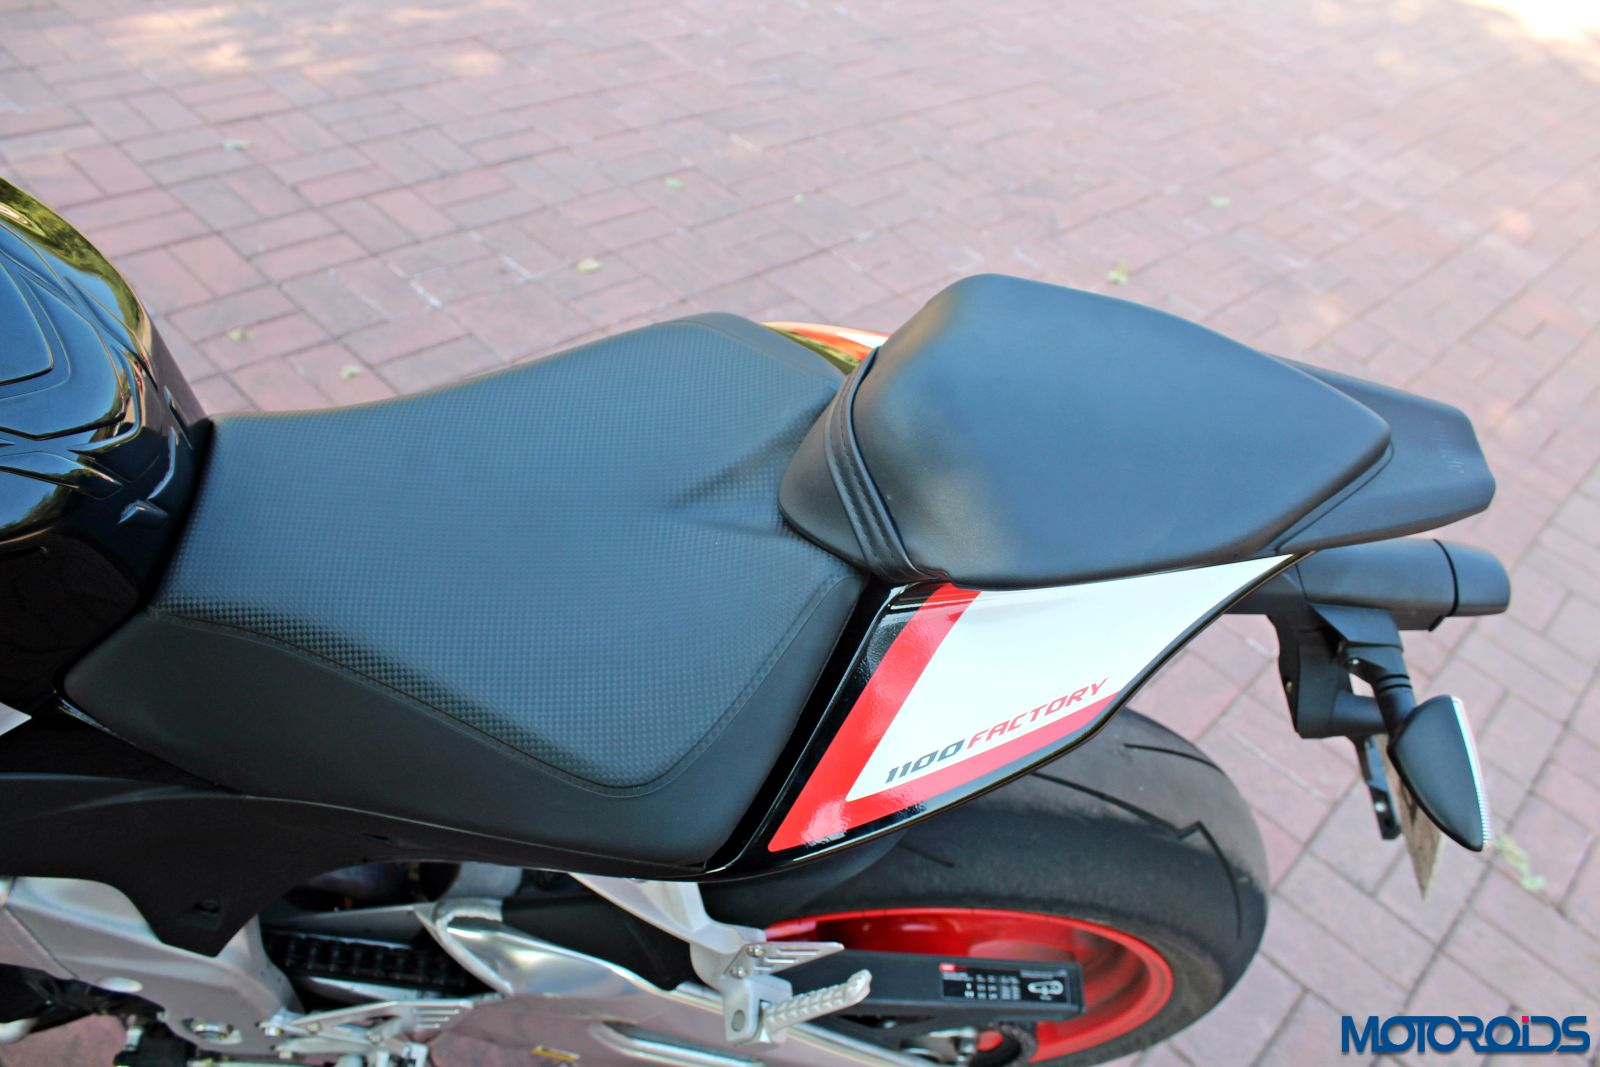 Aprilia Tuono V4 1100 Factory Review - Details and Stills (152)